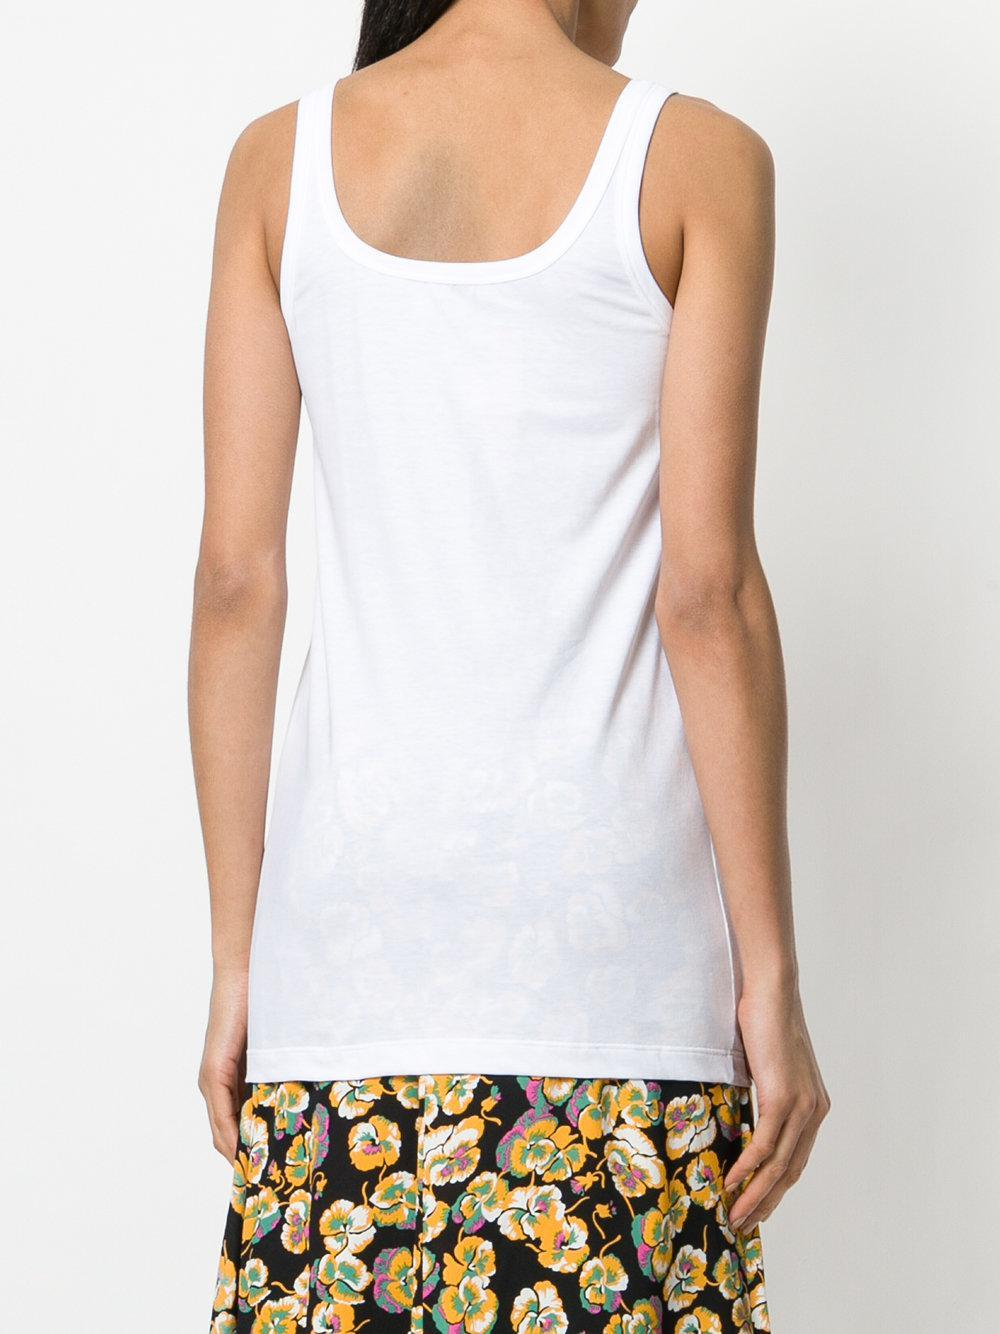 N°21 Cotton Cherie Longline Vest in White